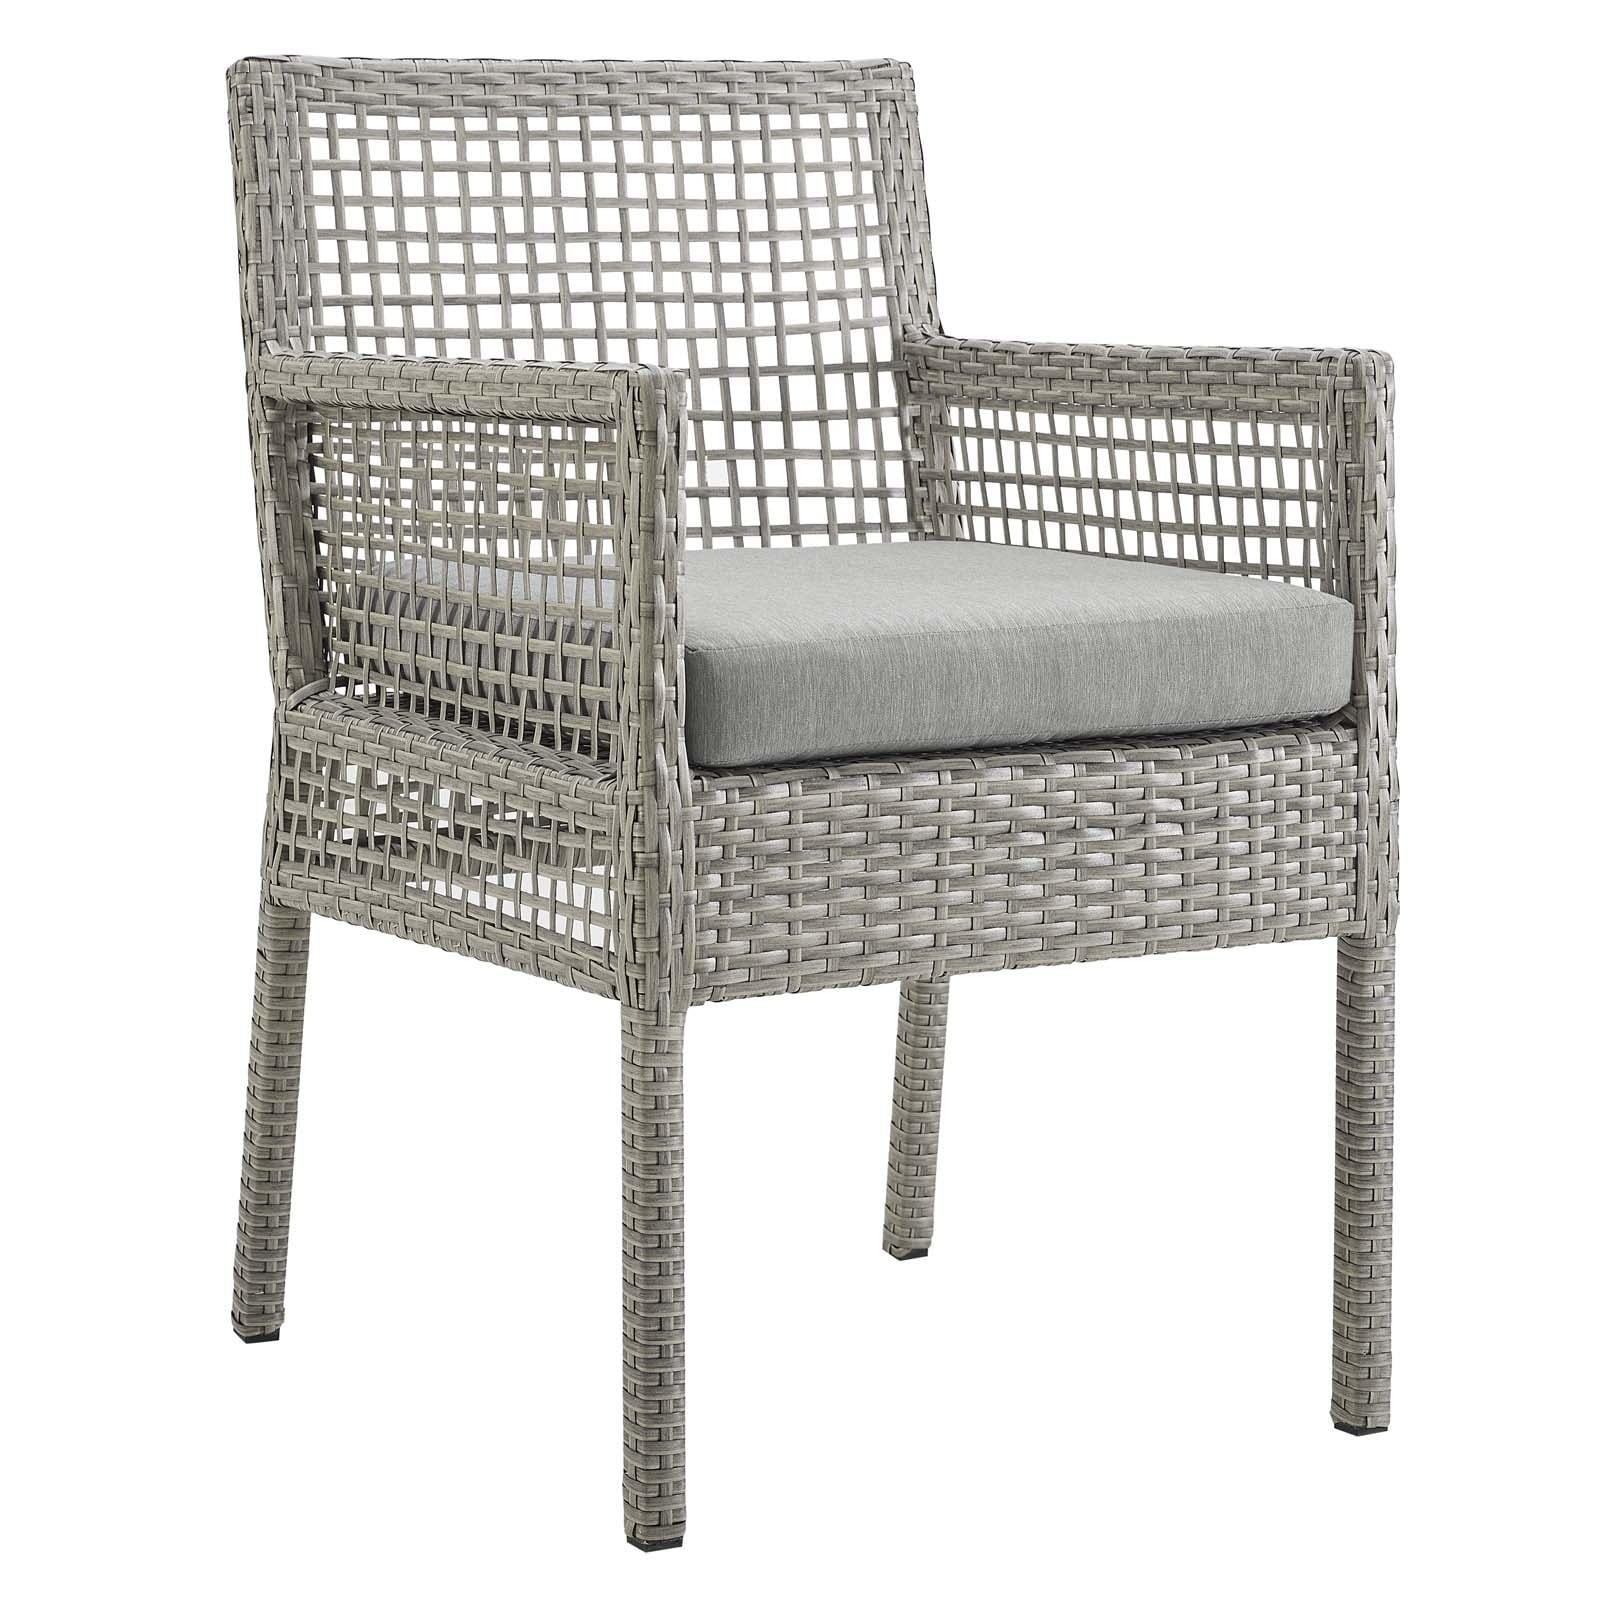 Astounding Aura Outdoor Patio Wicker Rattan Dining Armchair Ncnpc Chair Design For Home Ncnpcorg